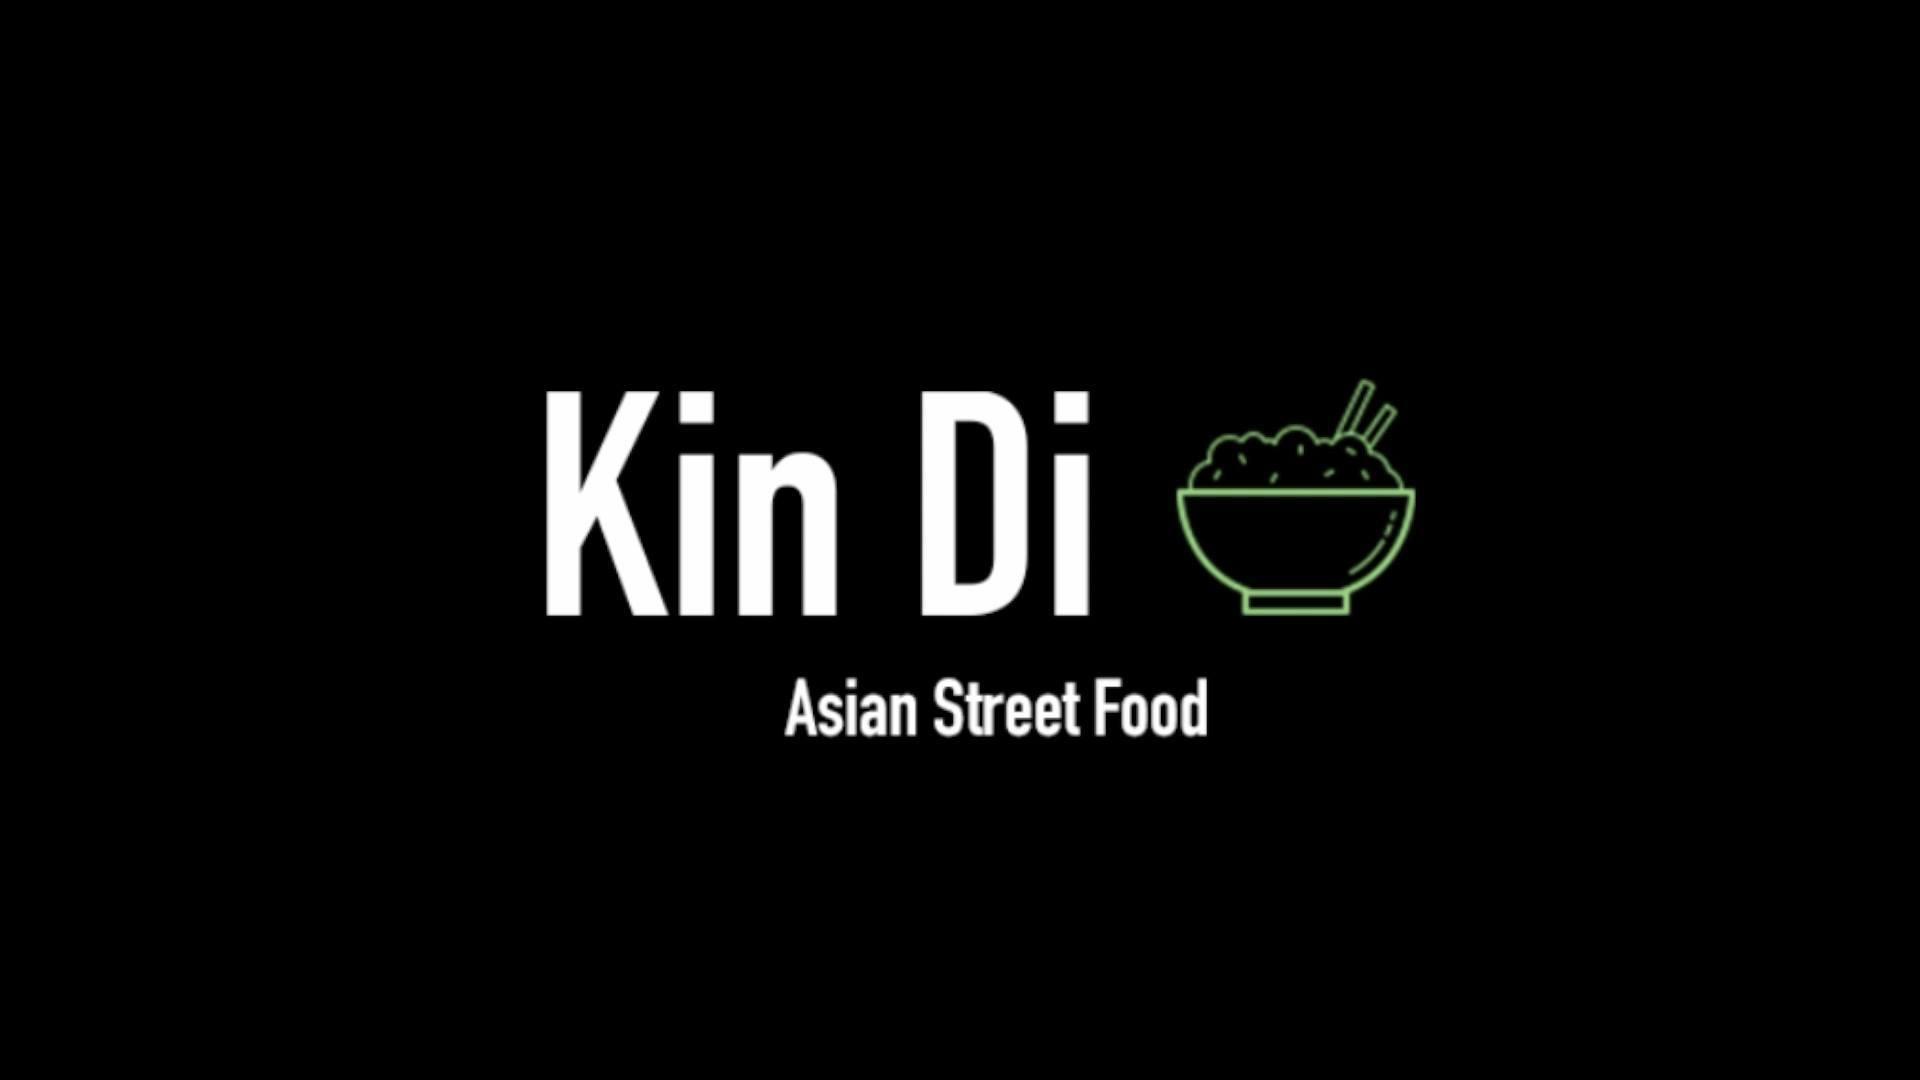 Kin Di Asian street food à Paramé Saint-Malo